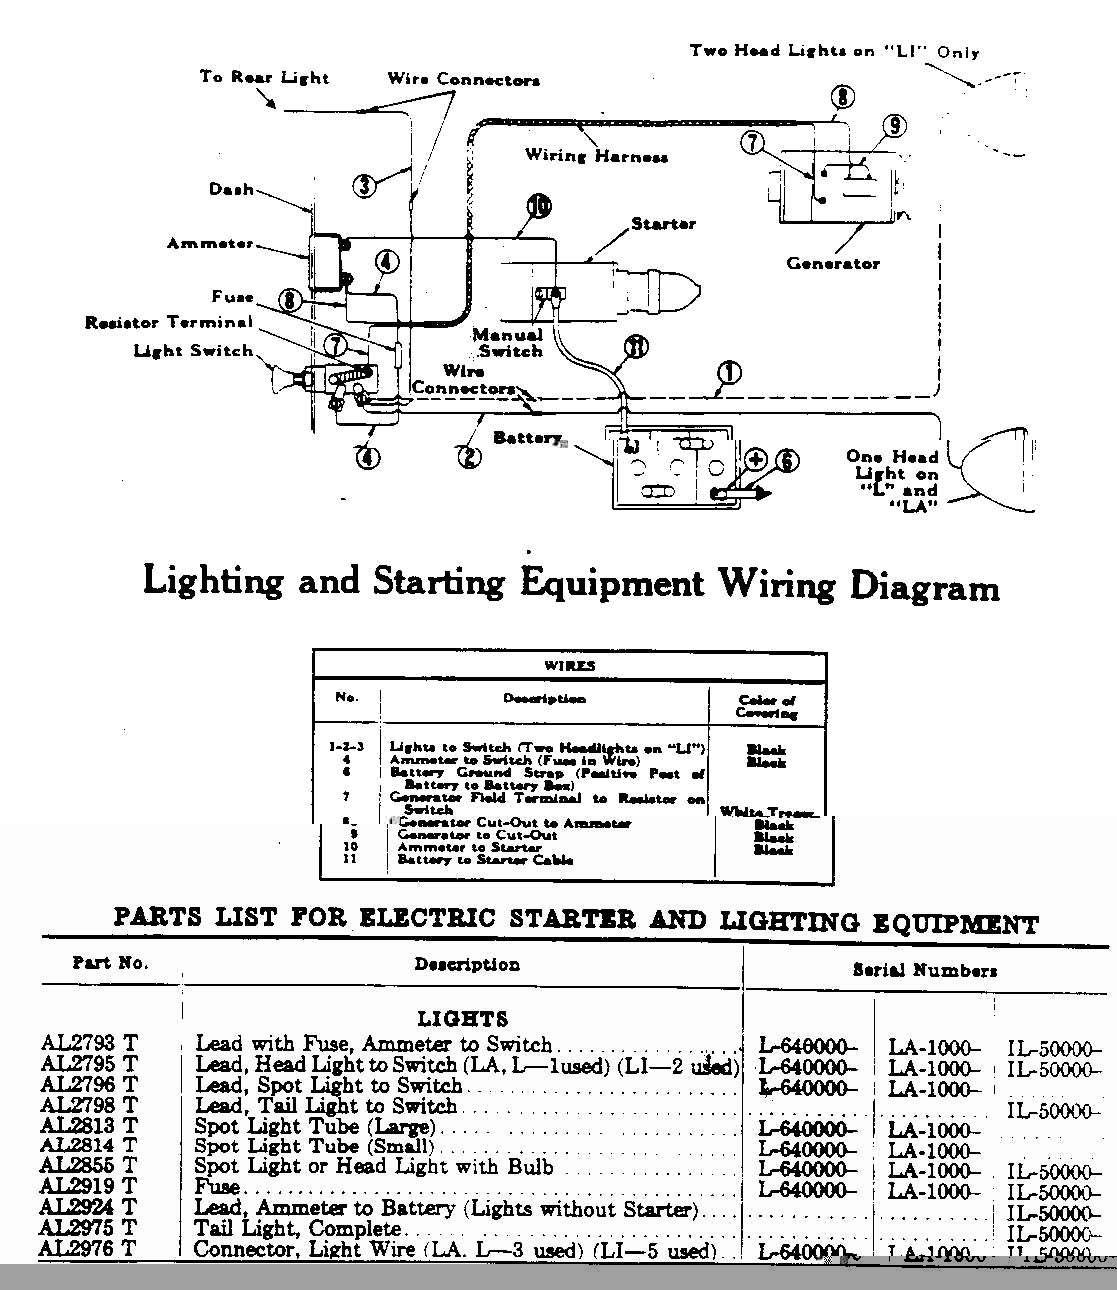 john deere model a wiring diagram john image john deere stx38 starter wiring diagram kenwood kvt 911dvd wiring on john deere model a wiring